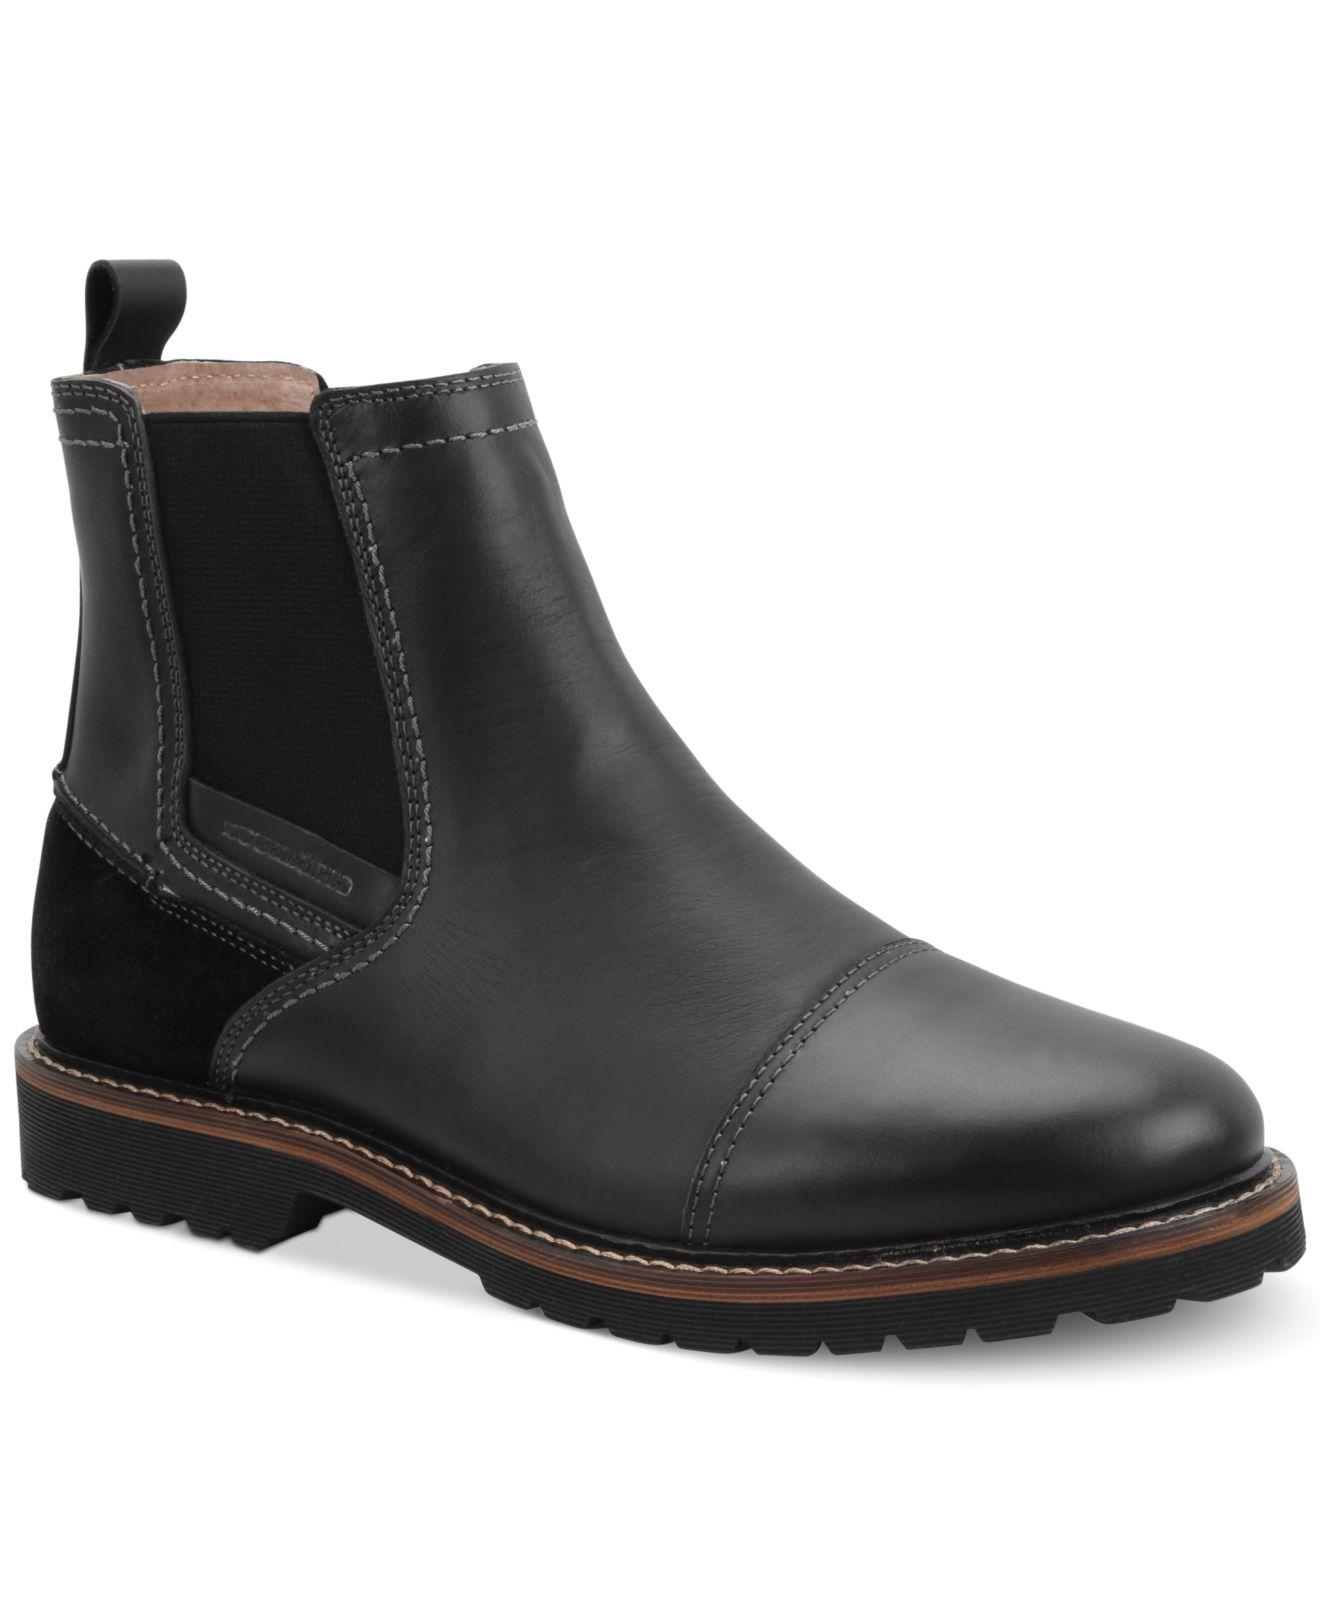 Black Chelsea Boots For Men Images Plain Raglan Tee Price